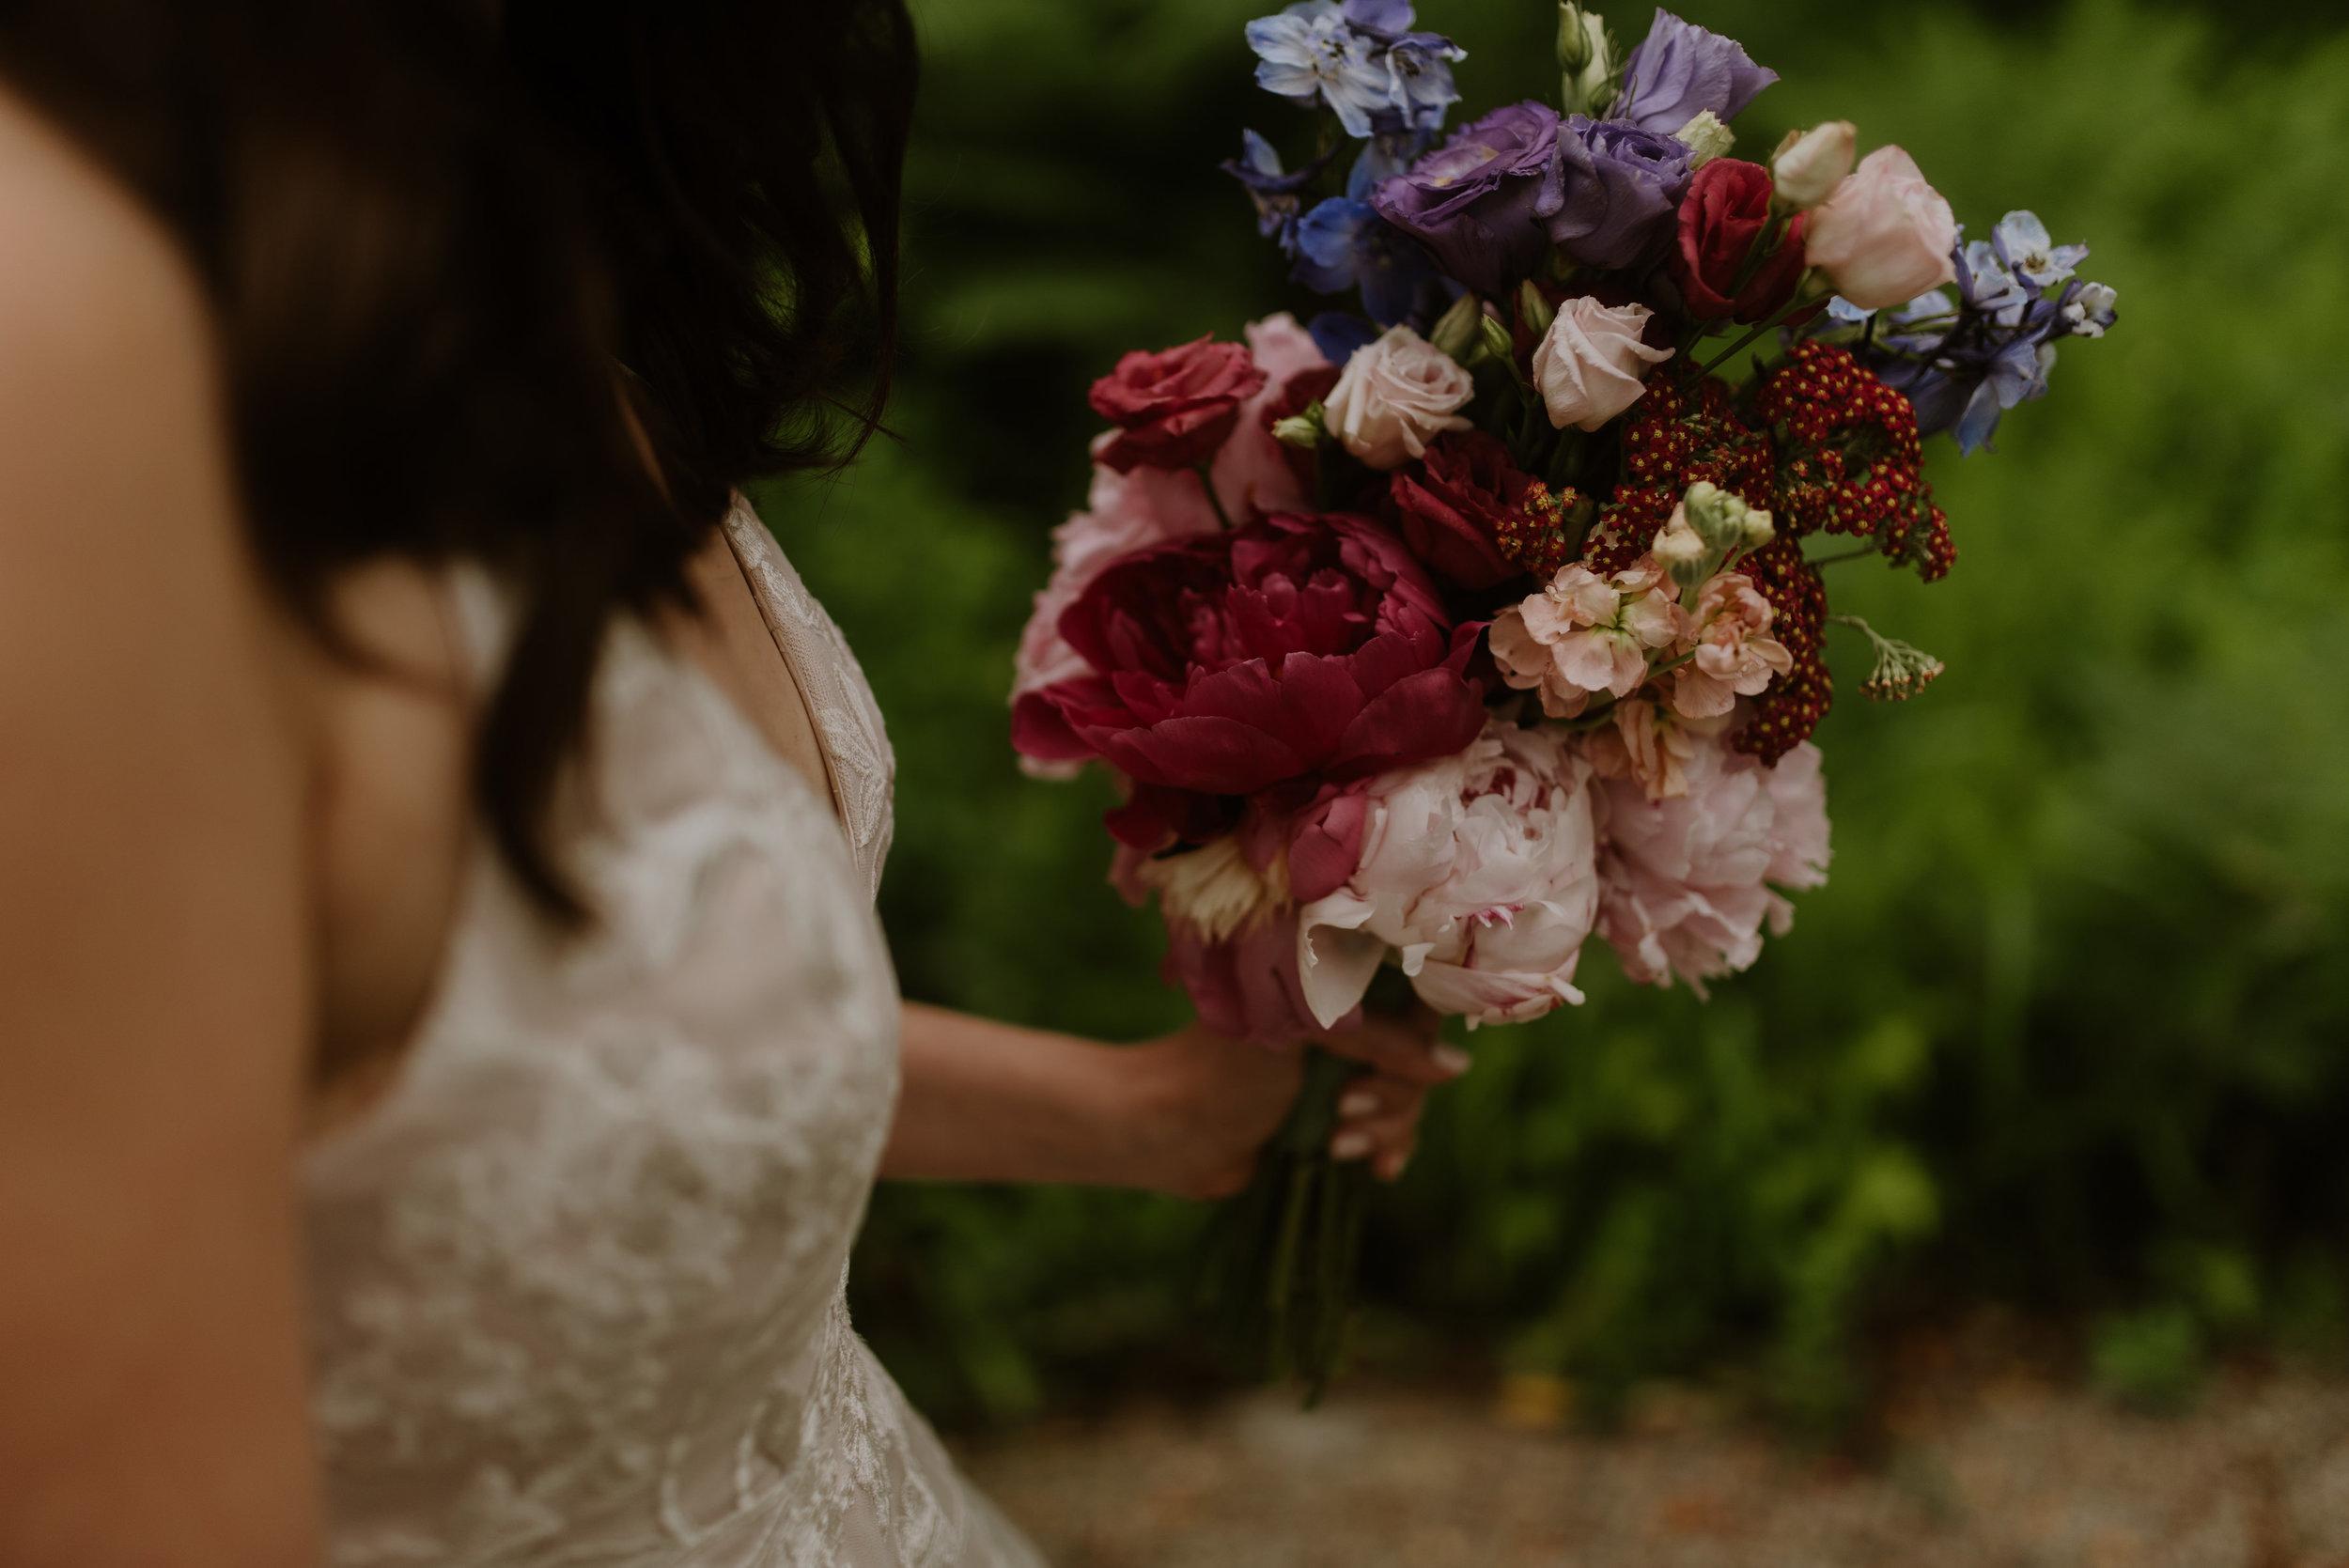 Cassandra-Anu-Wedding-Upstate-Catskills-Summer-Meadowlark-Stills-Lawrence-Braun-FINAL-0325.jpg